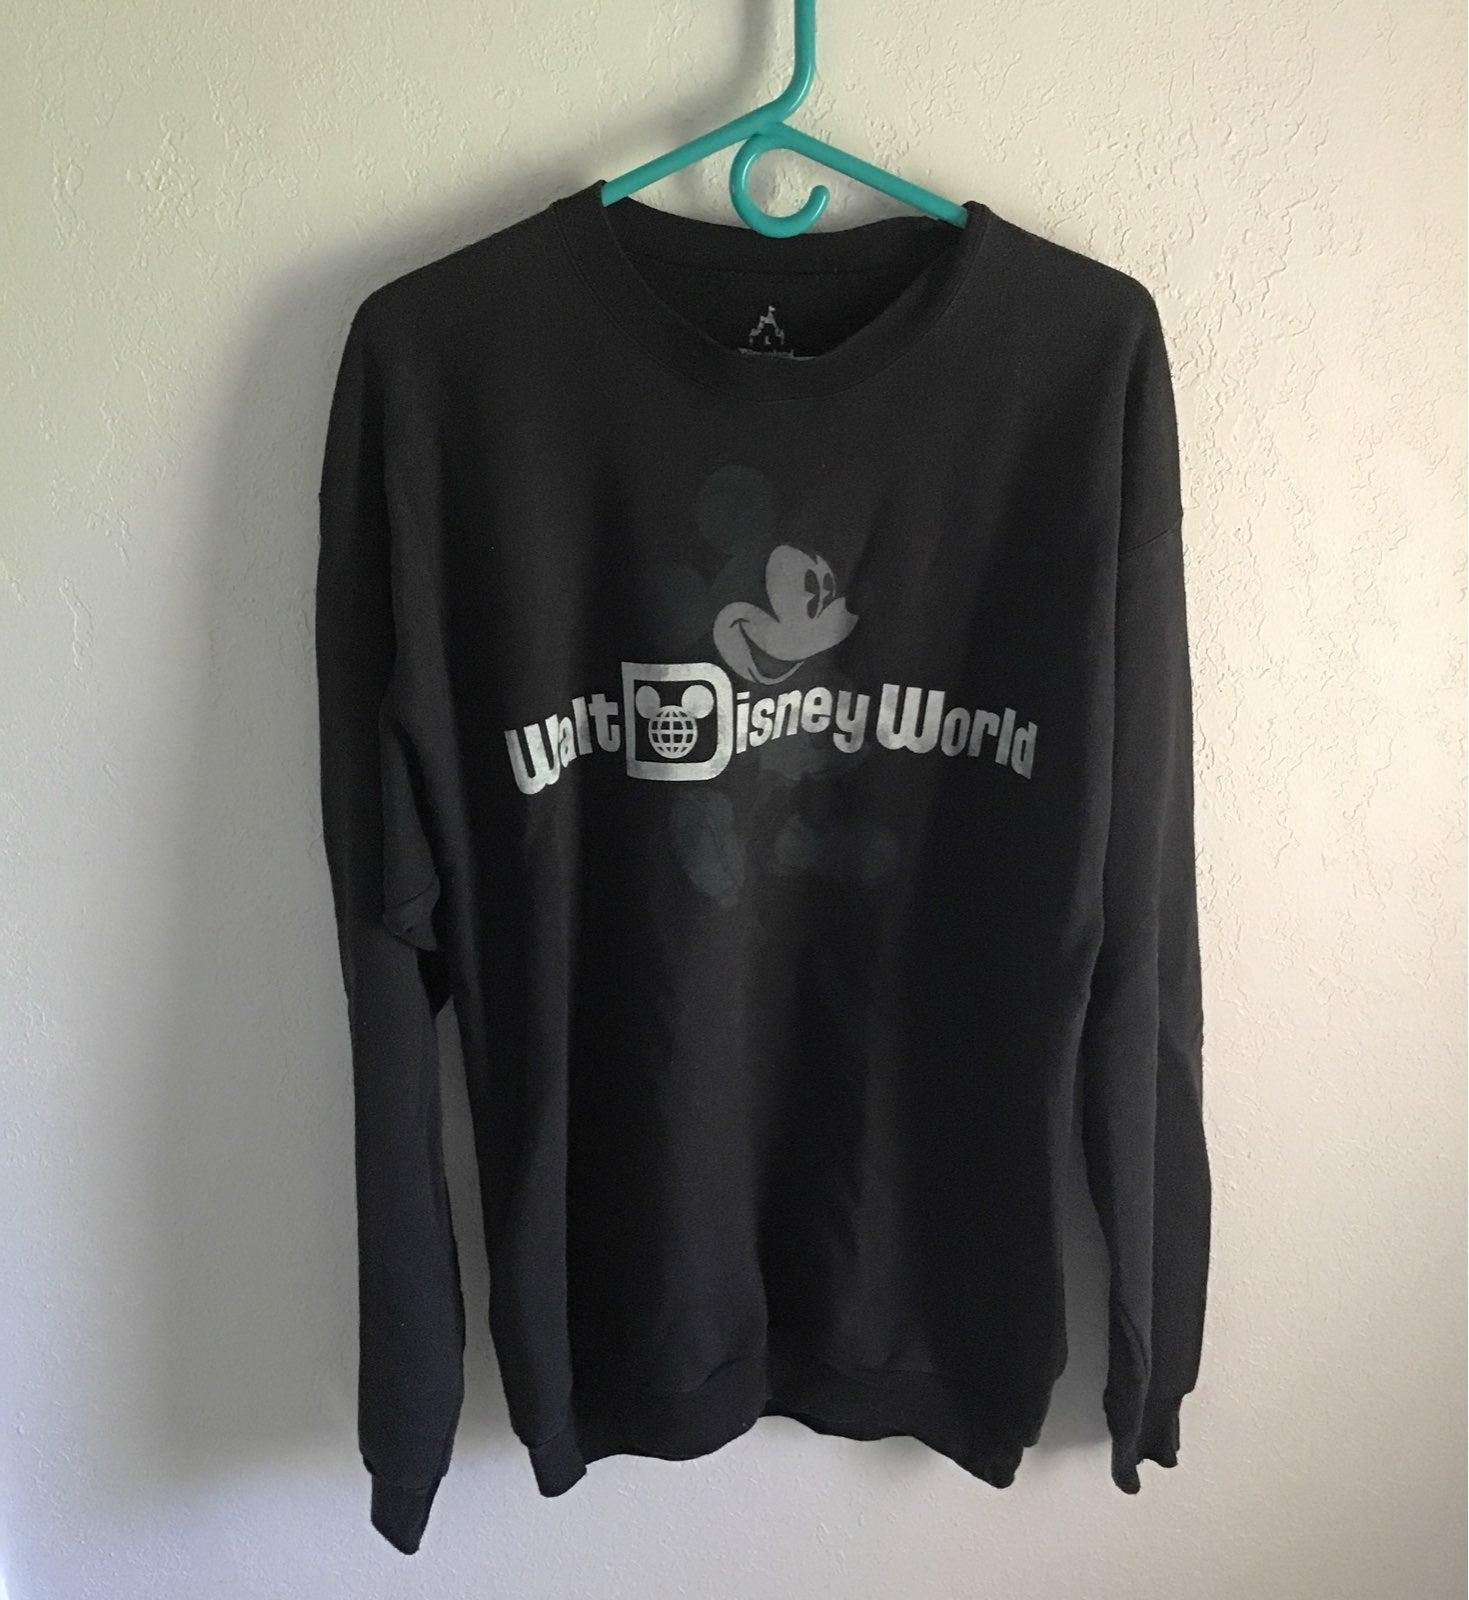 Vintage Disney World sweatshirt black